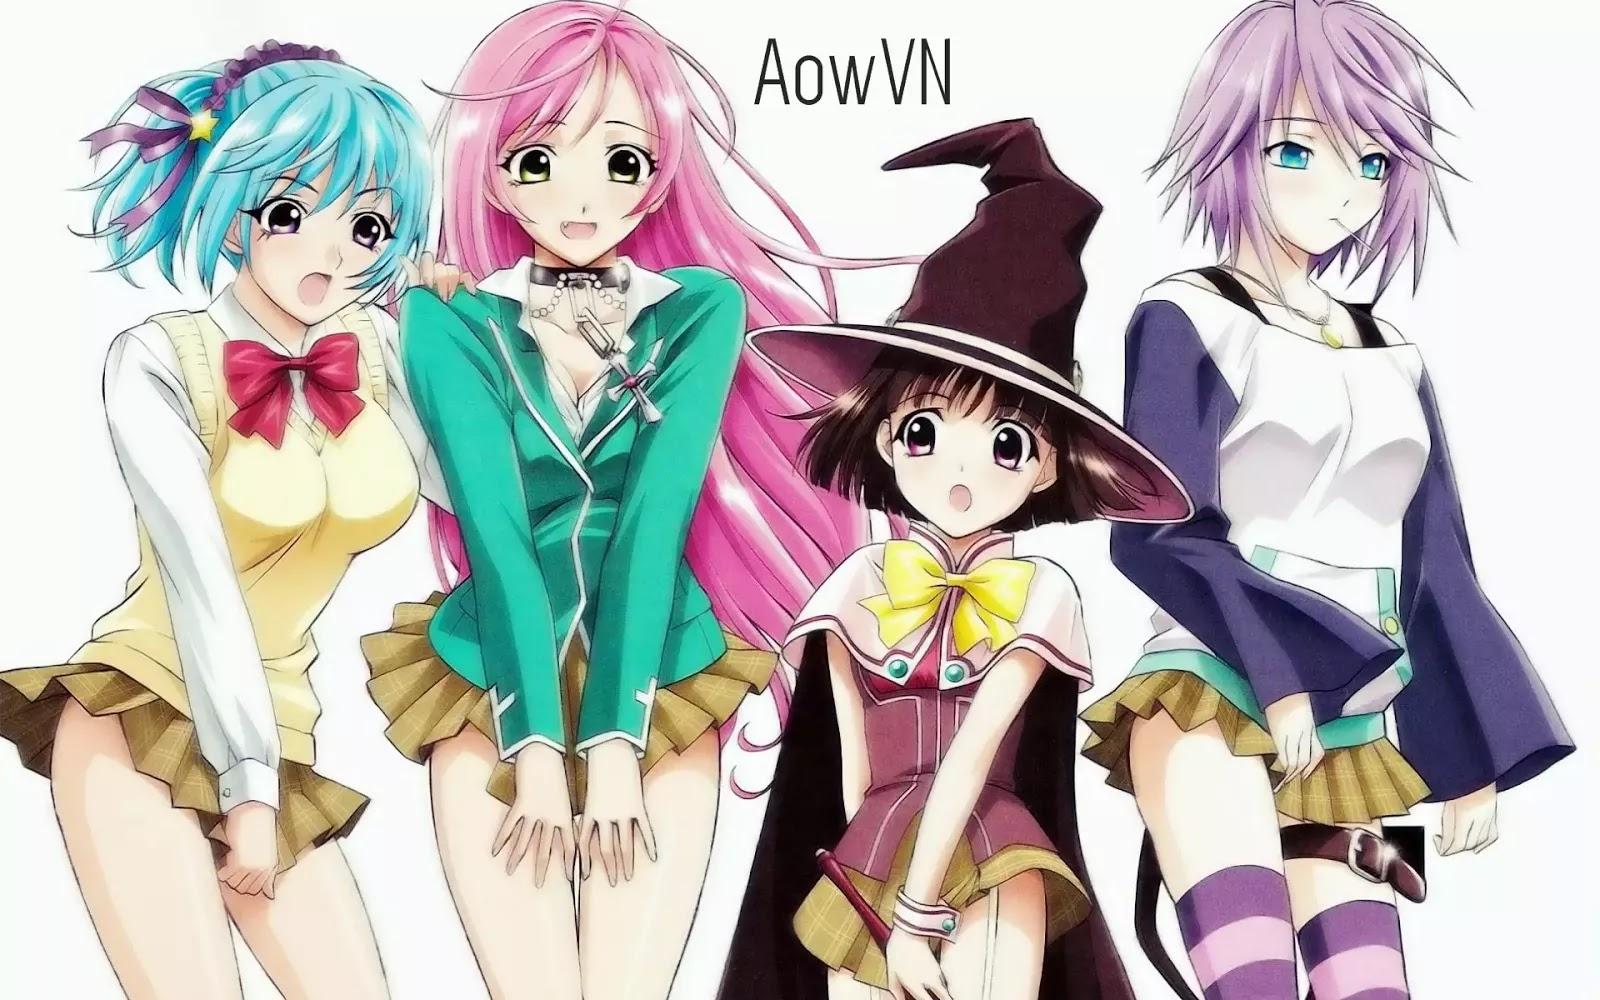 AowVN - [ Anime 3gp Mp4 ] Rosario and Vampire SS1 + SS2 | Vietsub - Ecchi Harem